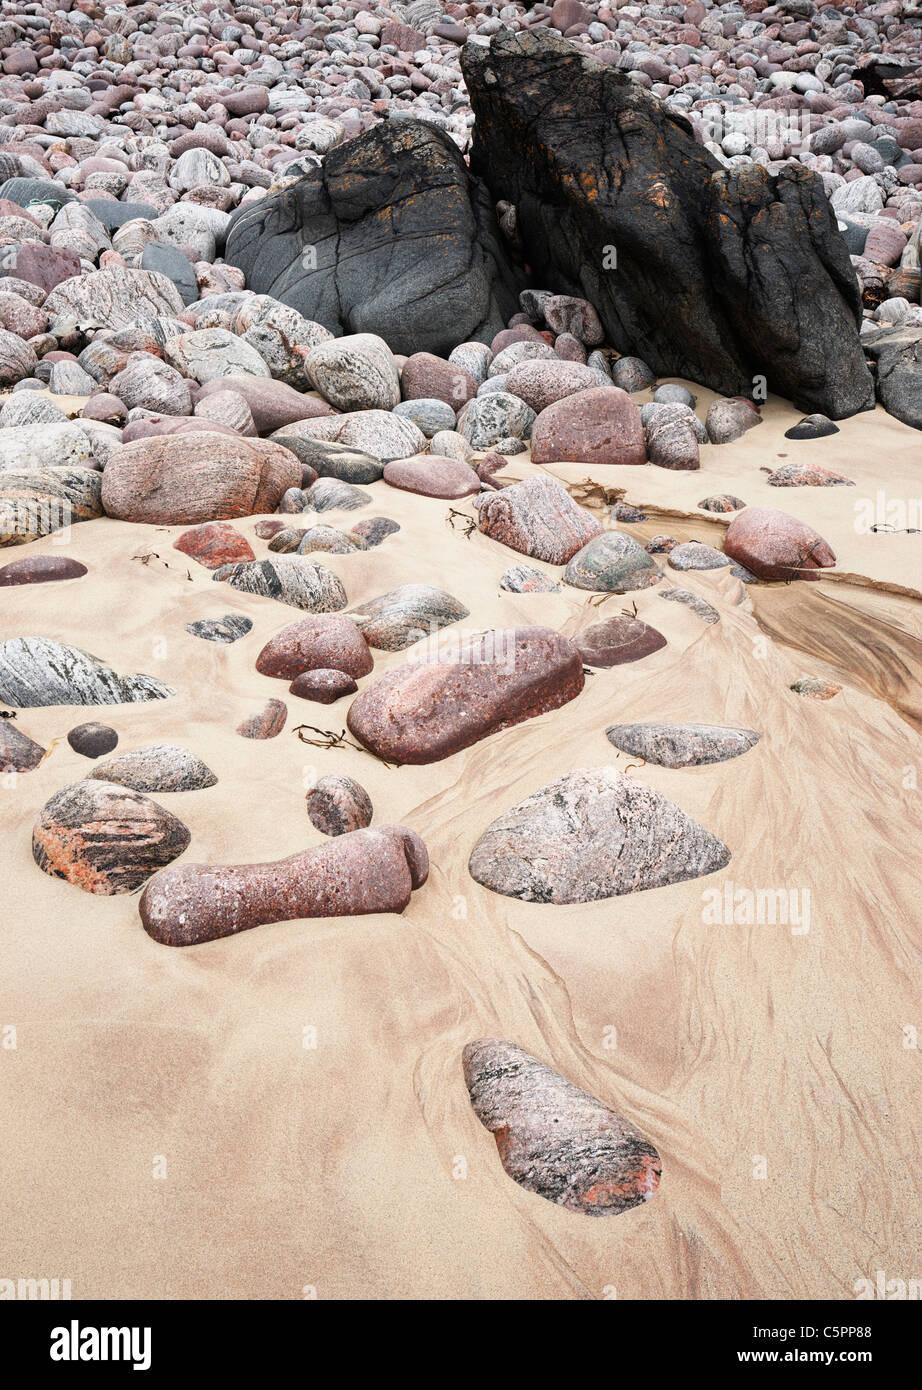 Stones and pebbles on the beach at Oldshoremore, Sutherland, Highland, UK. - Stock Image